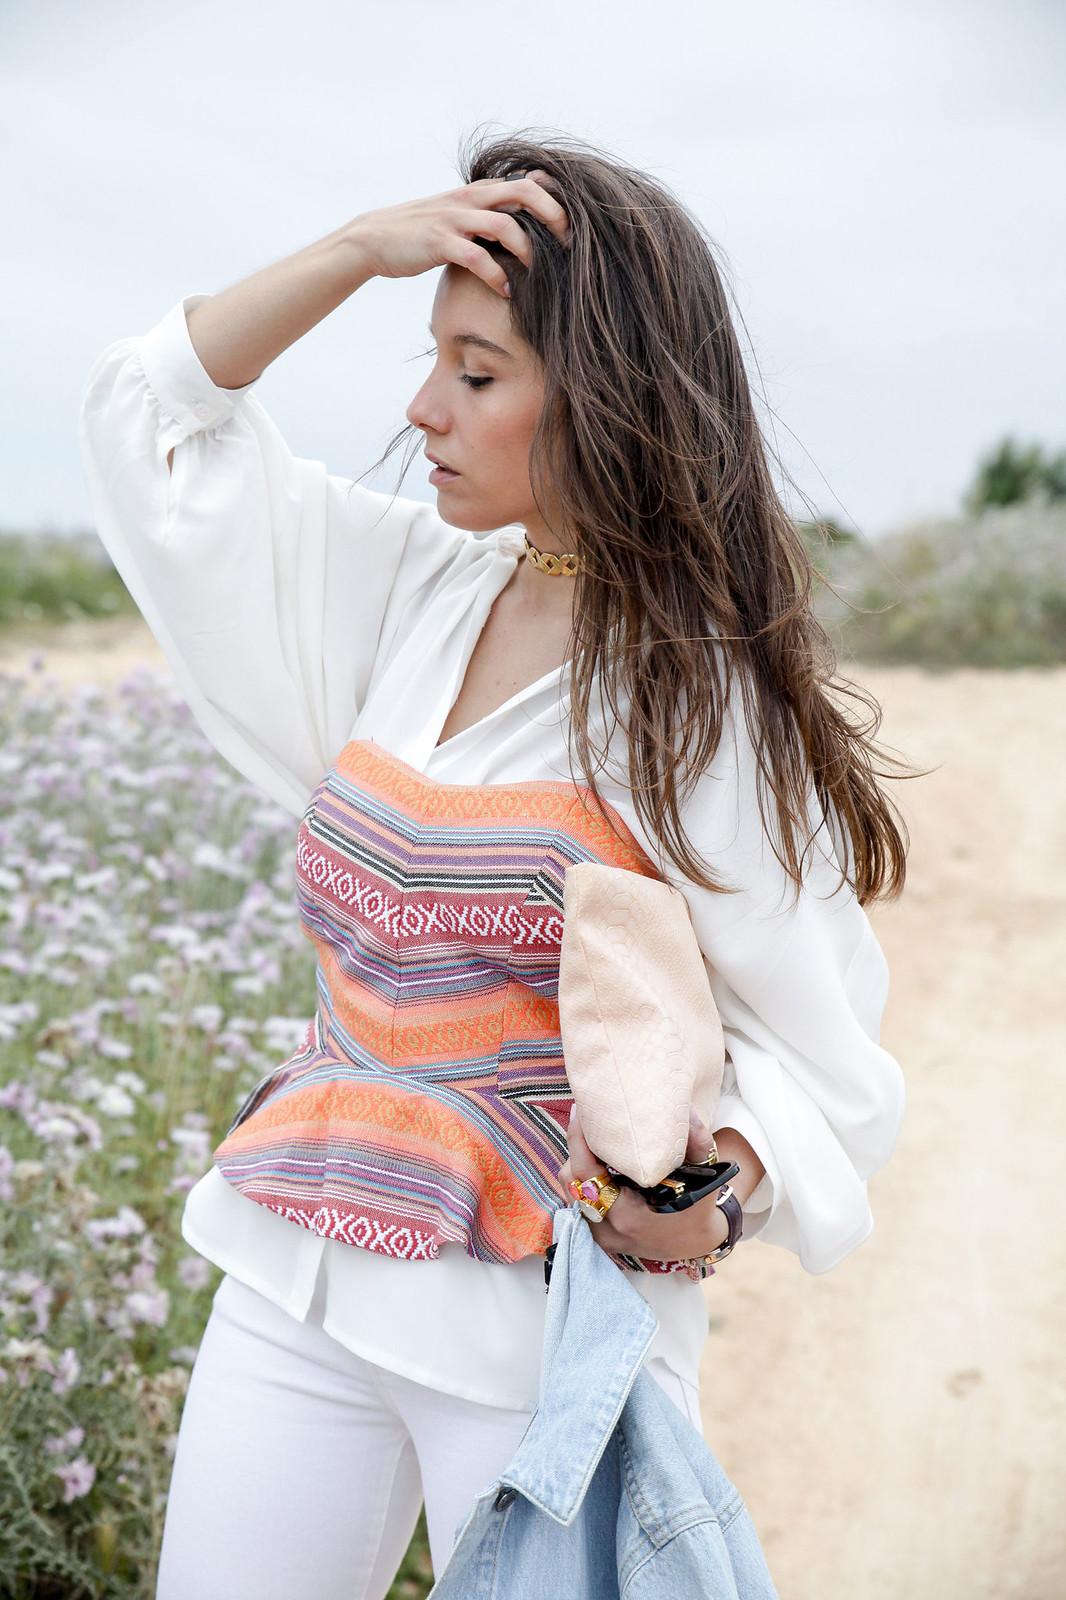 019_corset_etnico_danity_paris_theguestgirl_influencer_barcelona_laura_santolaria